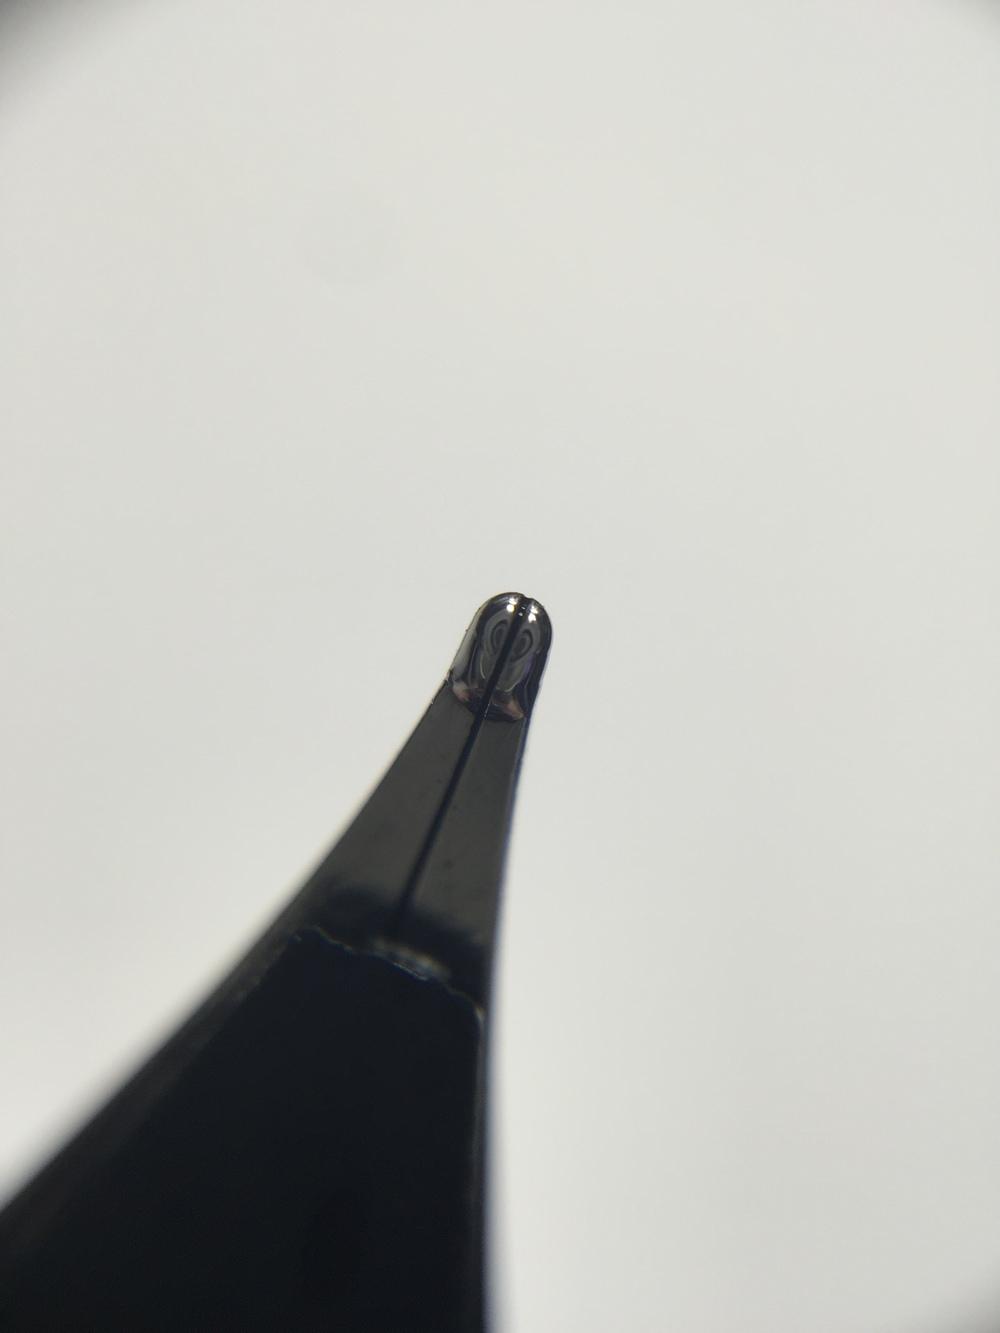 Underside of the nib